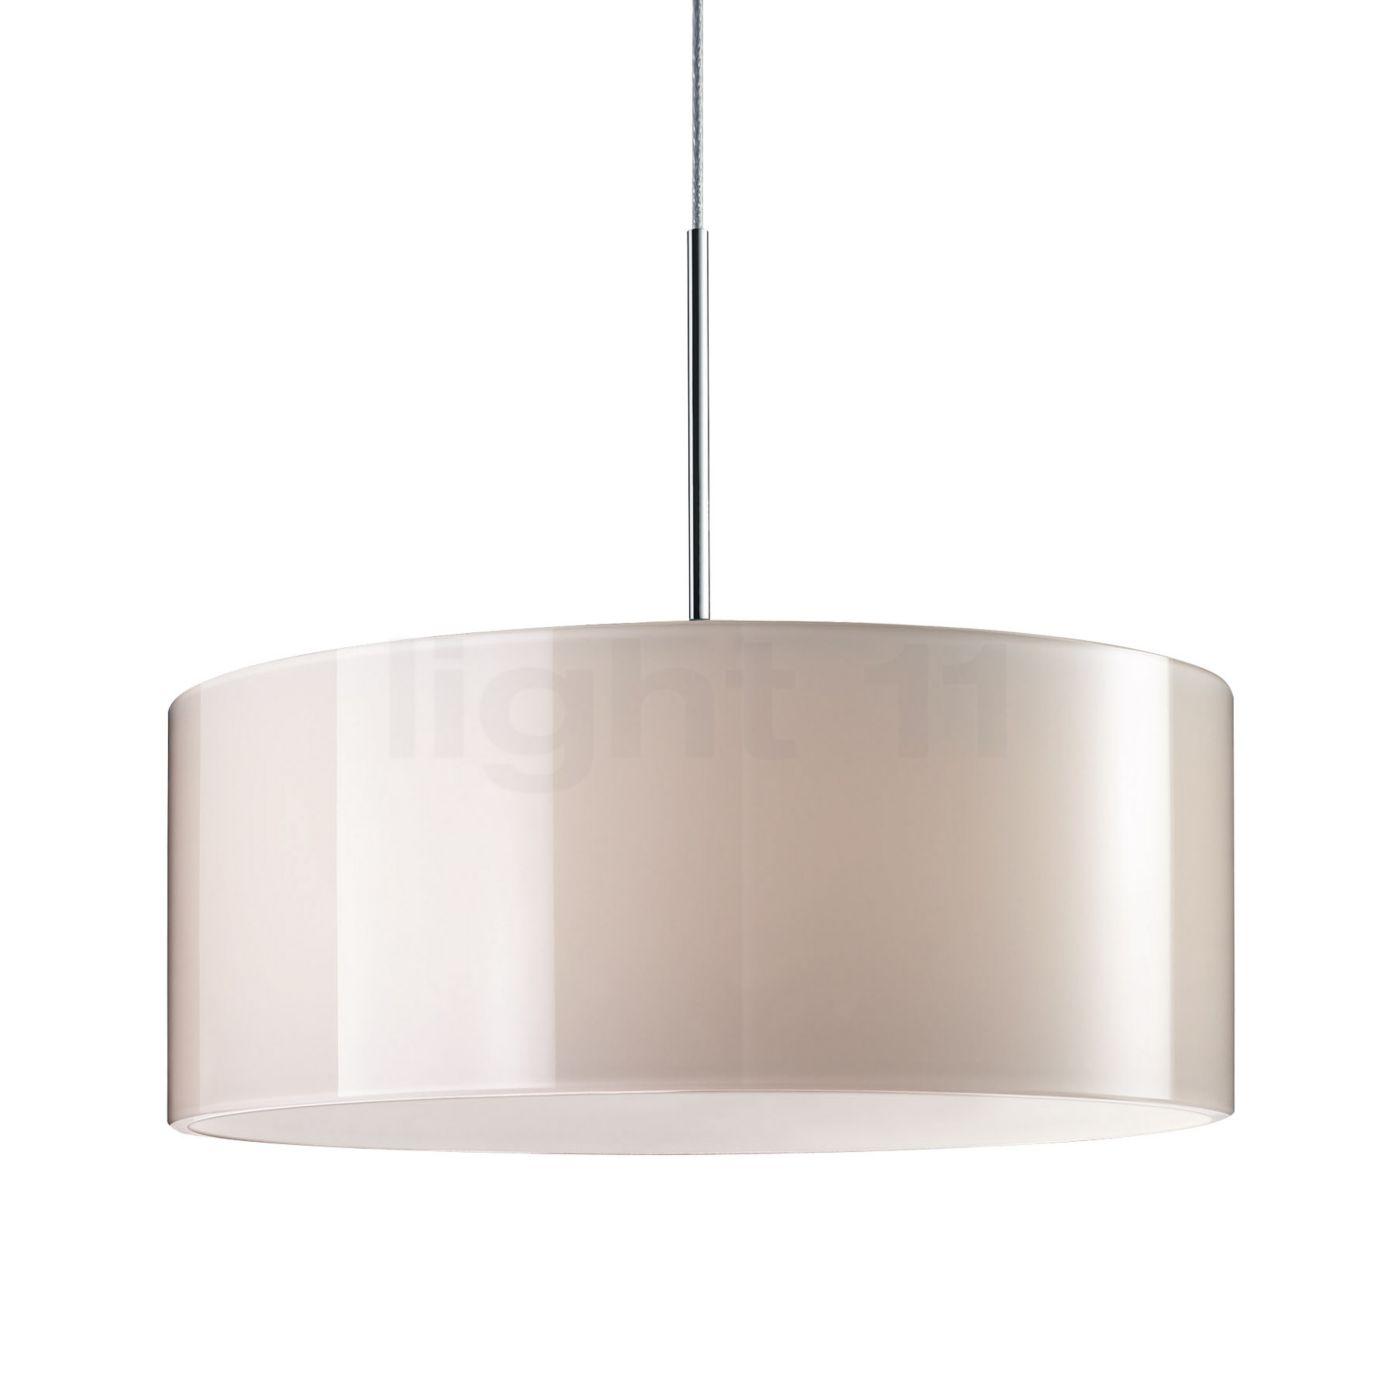 bruck cantara glas down led 300 pd s chrom gl nzend. Black Bedroom Furniture Sets. Home Design Ideas